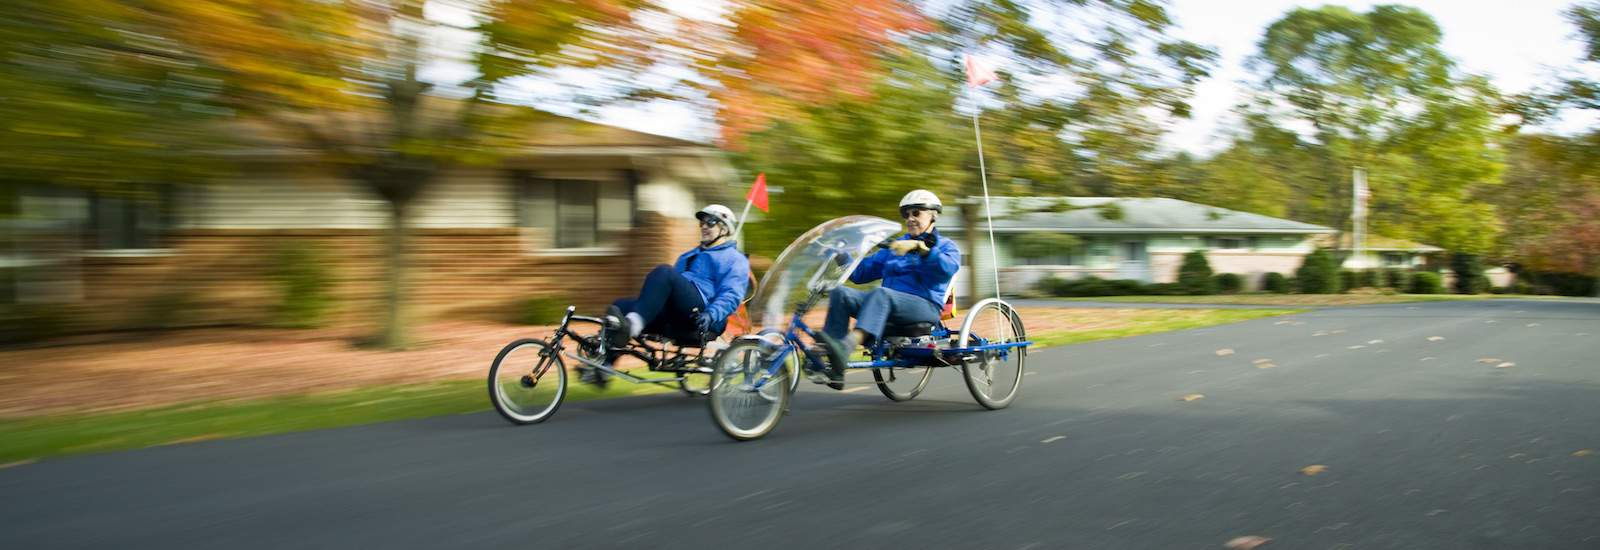 seniors cycling